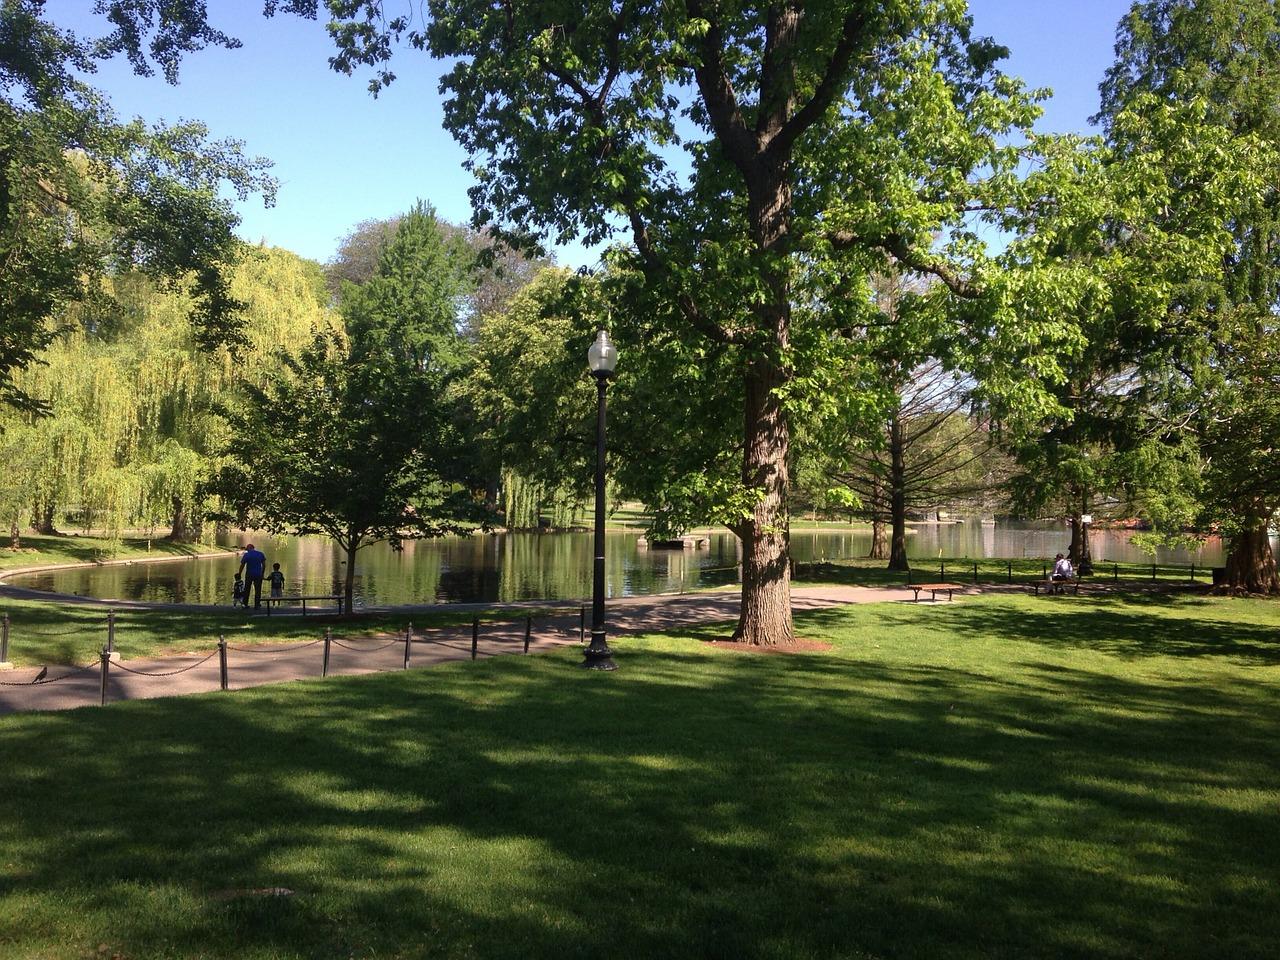 park-362066_1280